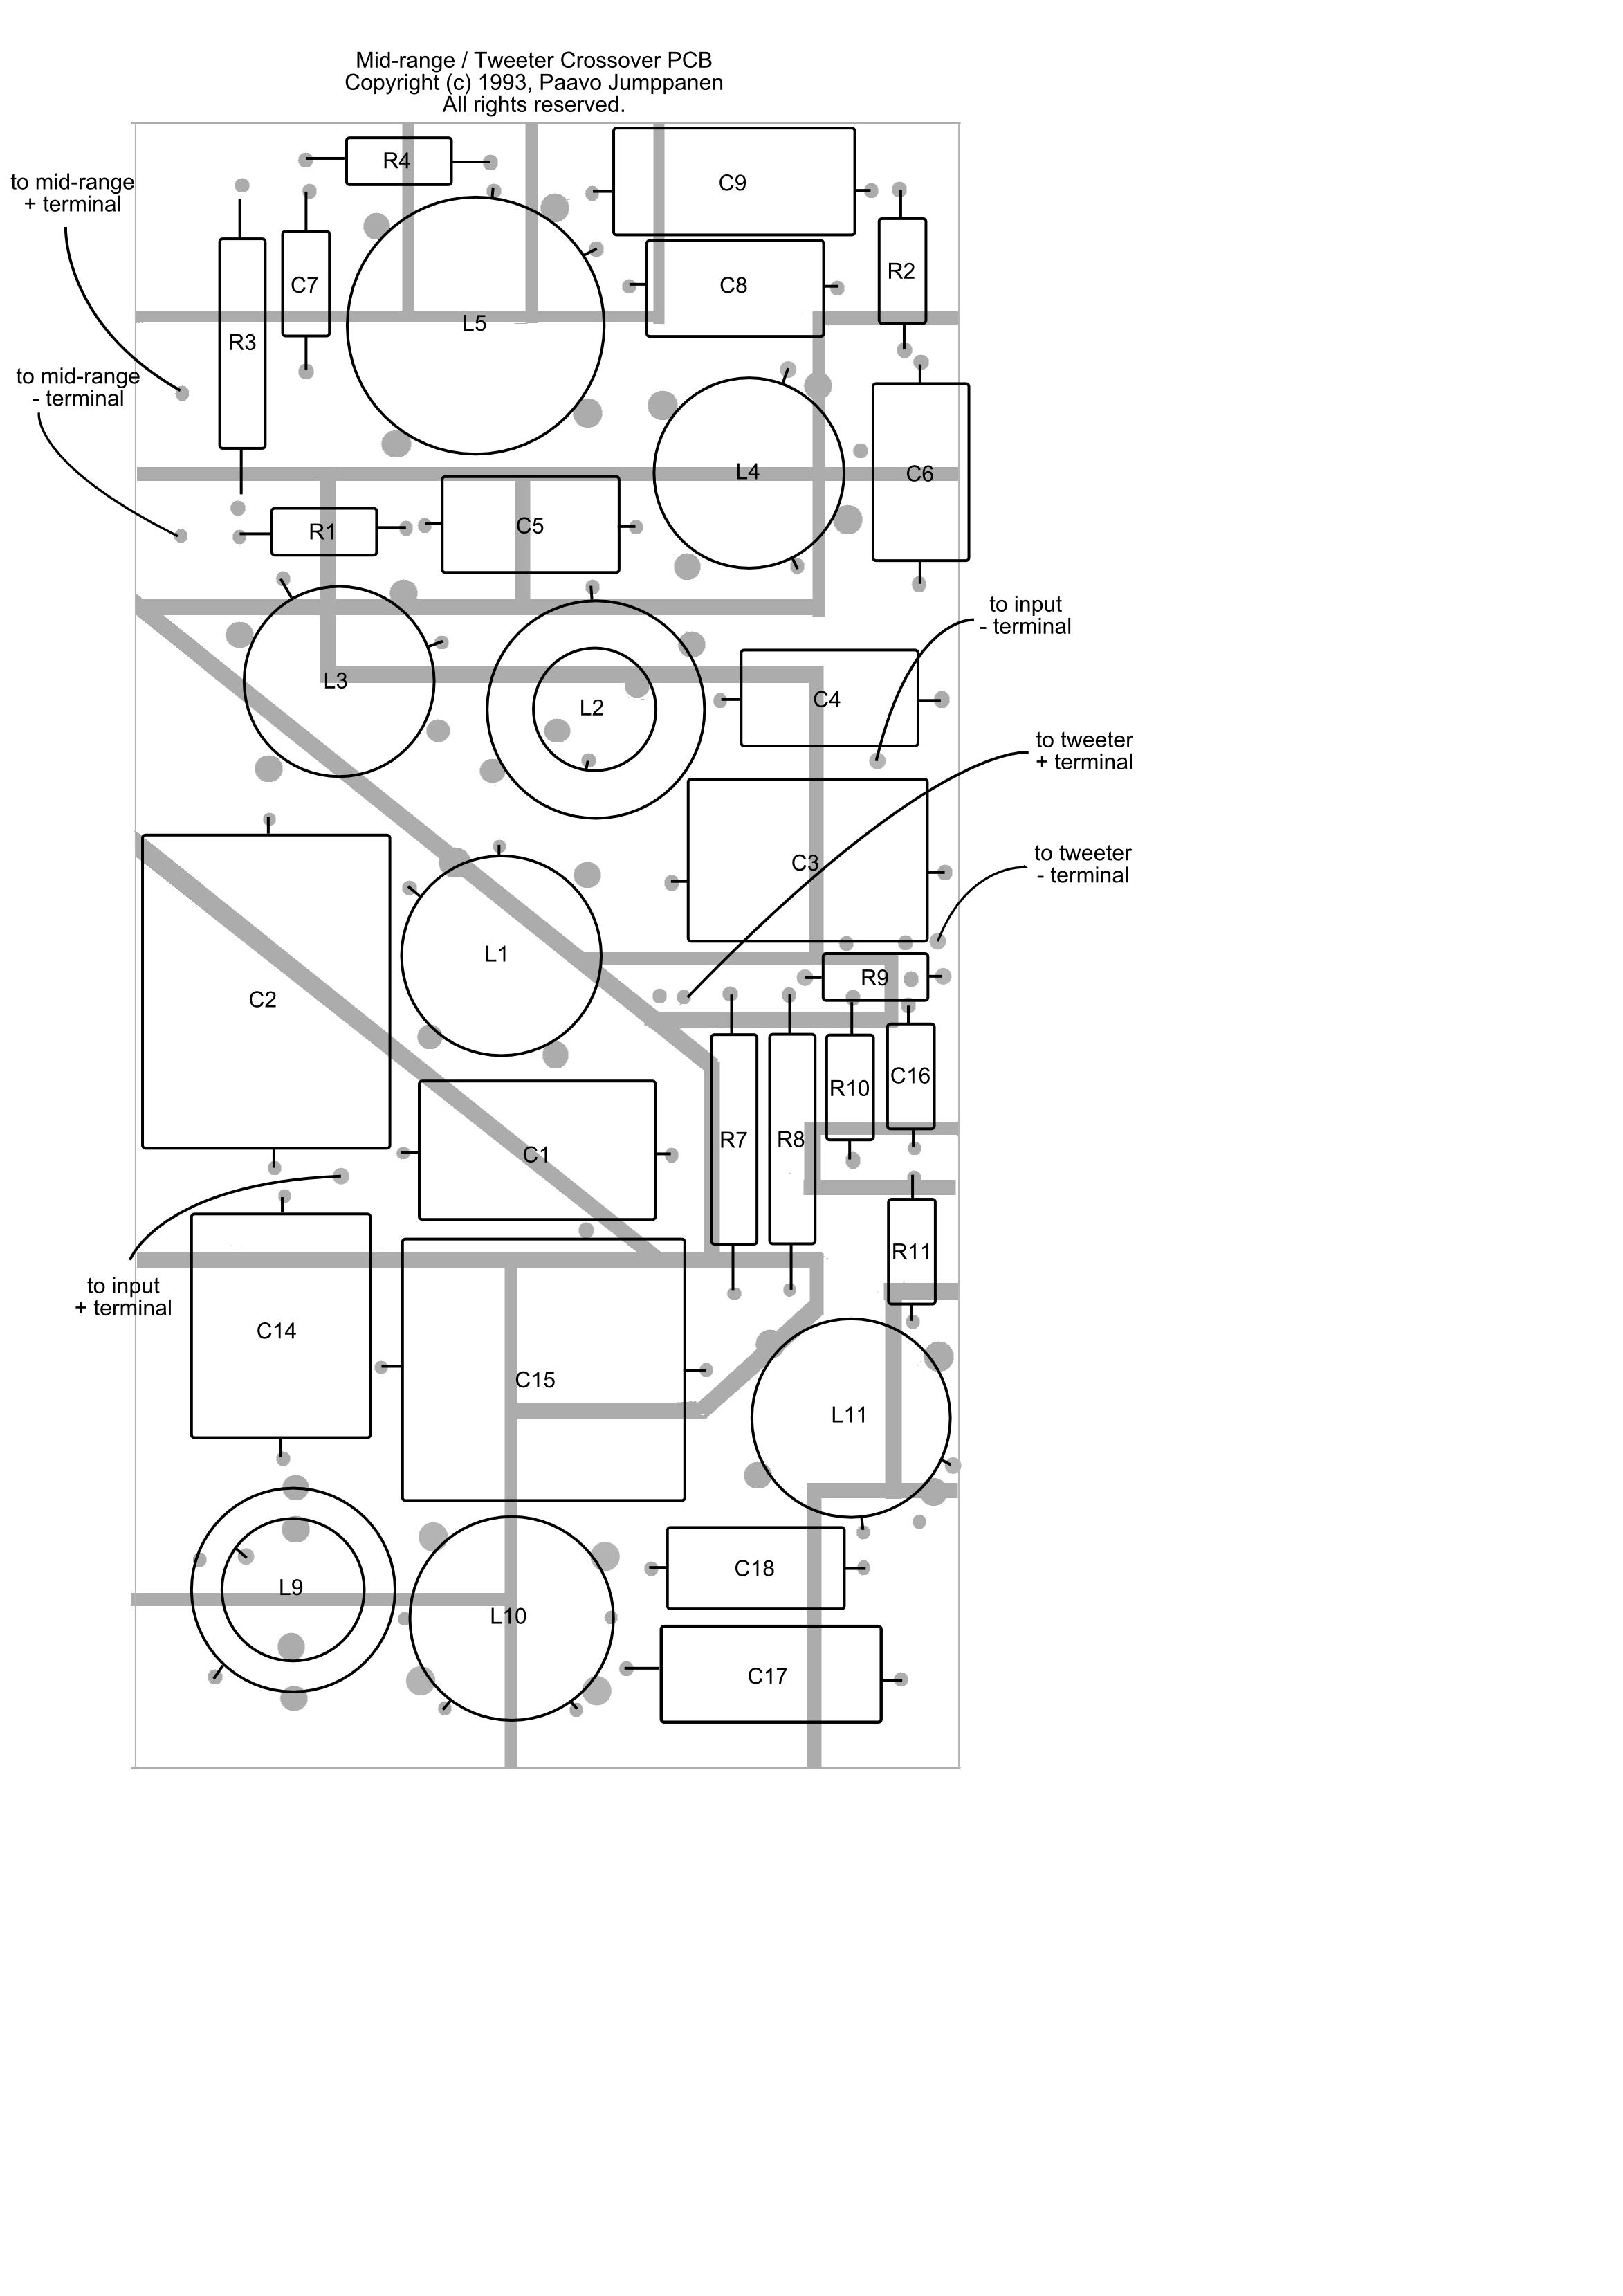 loudspeaker system design the final details har bal the rh har bal com Cat 5E Crossover Cable Diagram DBX Crossover Wiring-Diagram